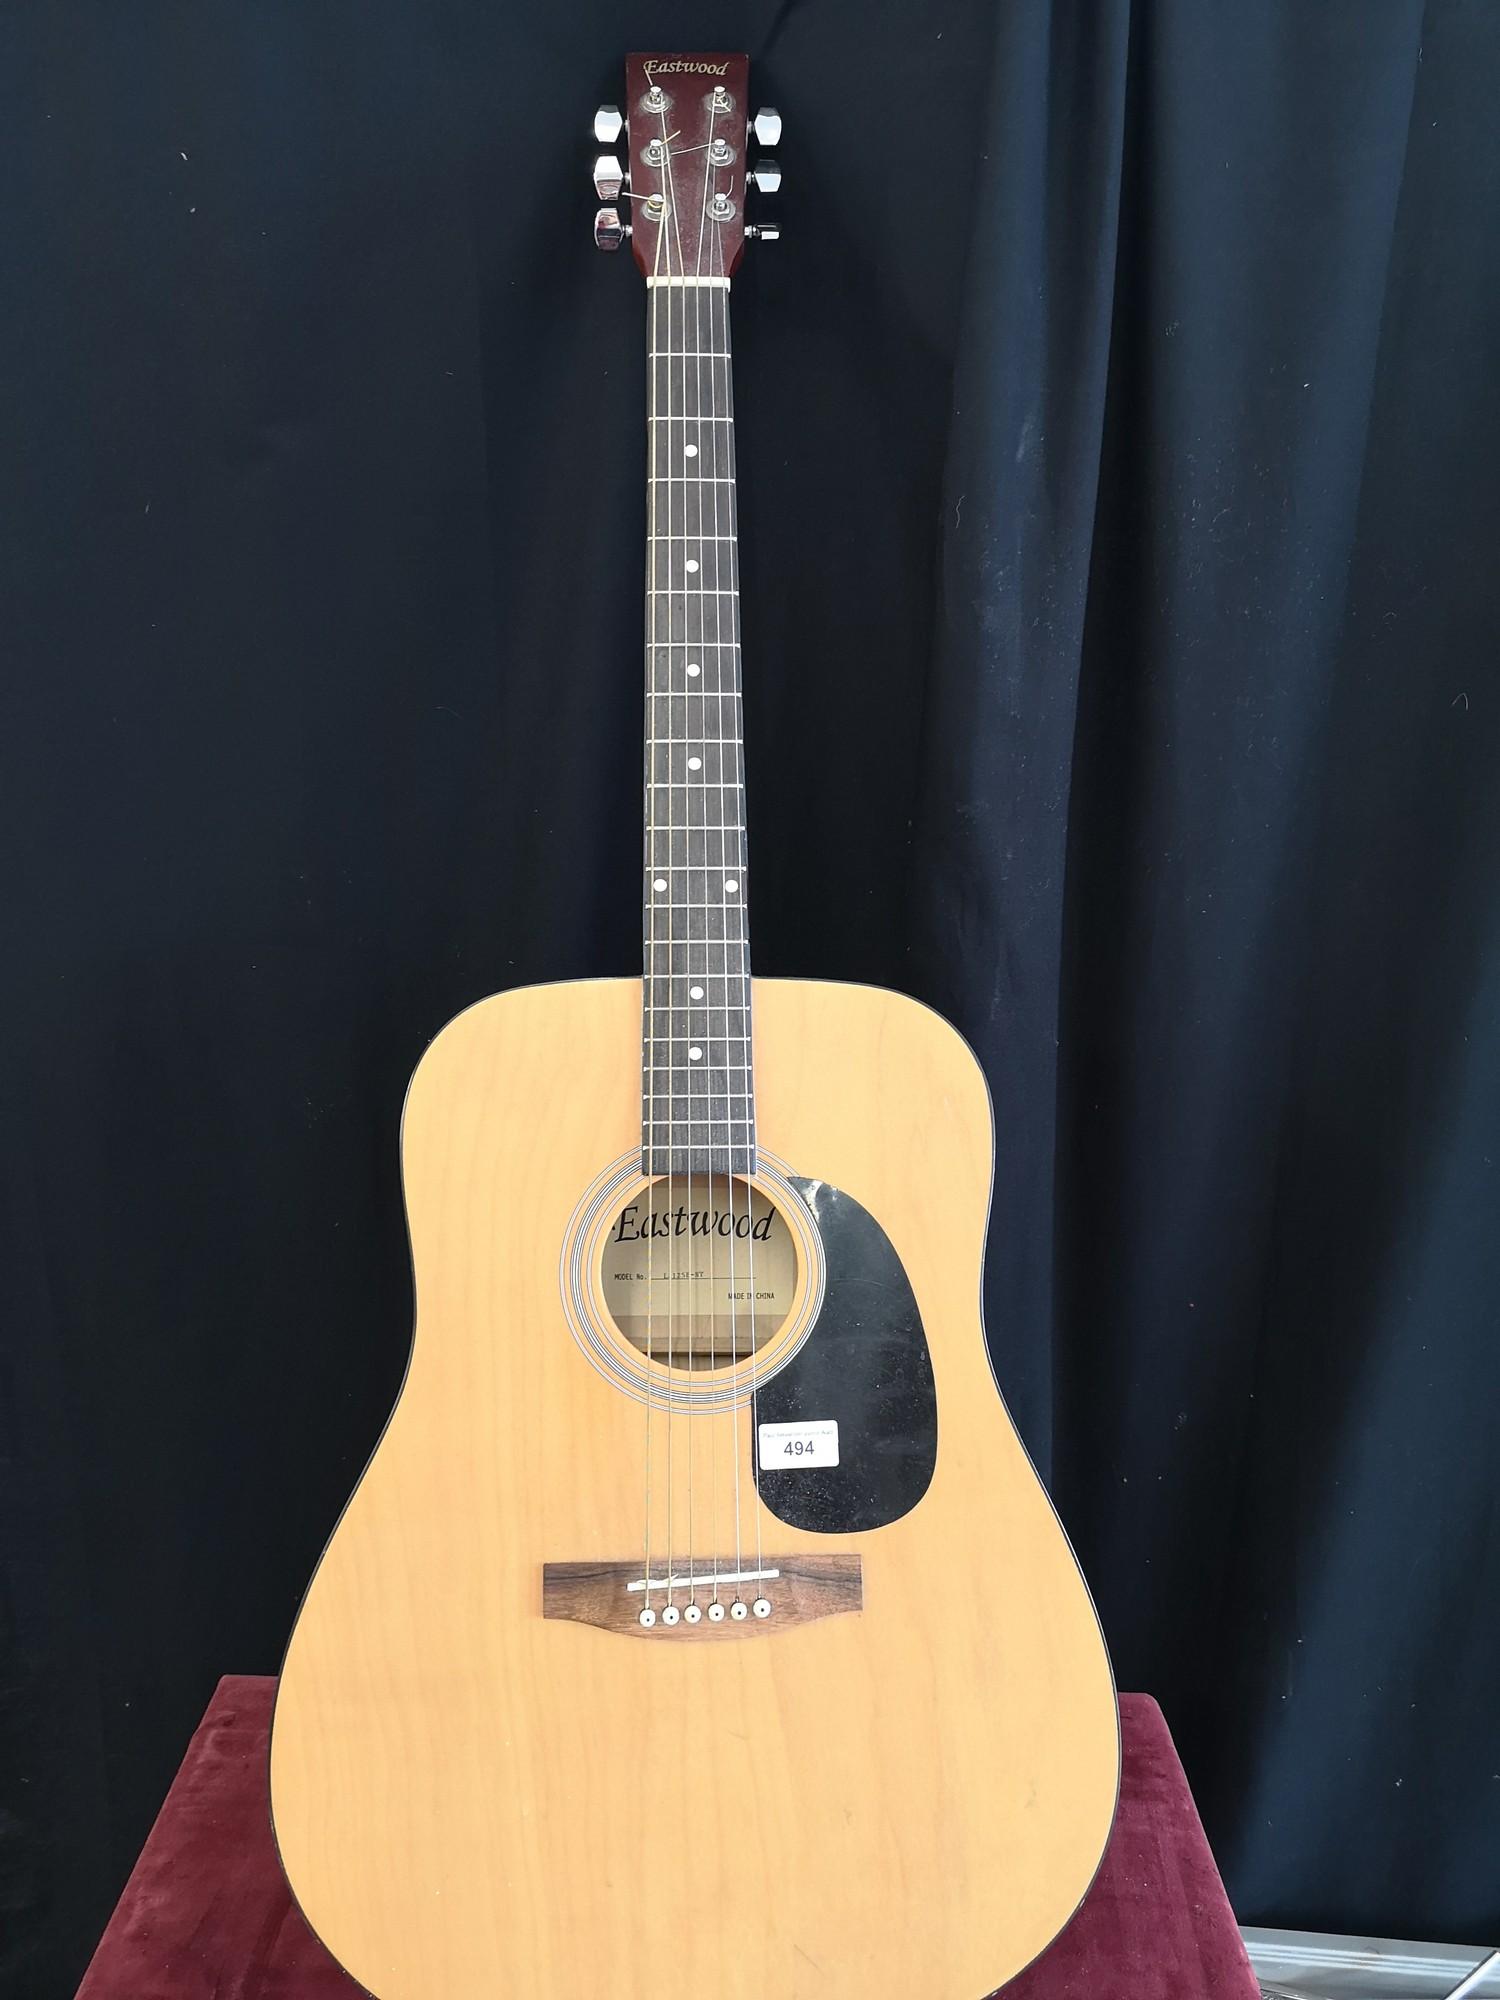 Eastwood acoustic guitar.